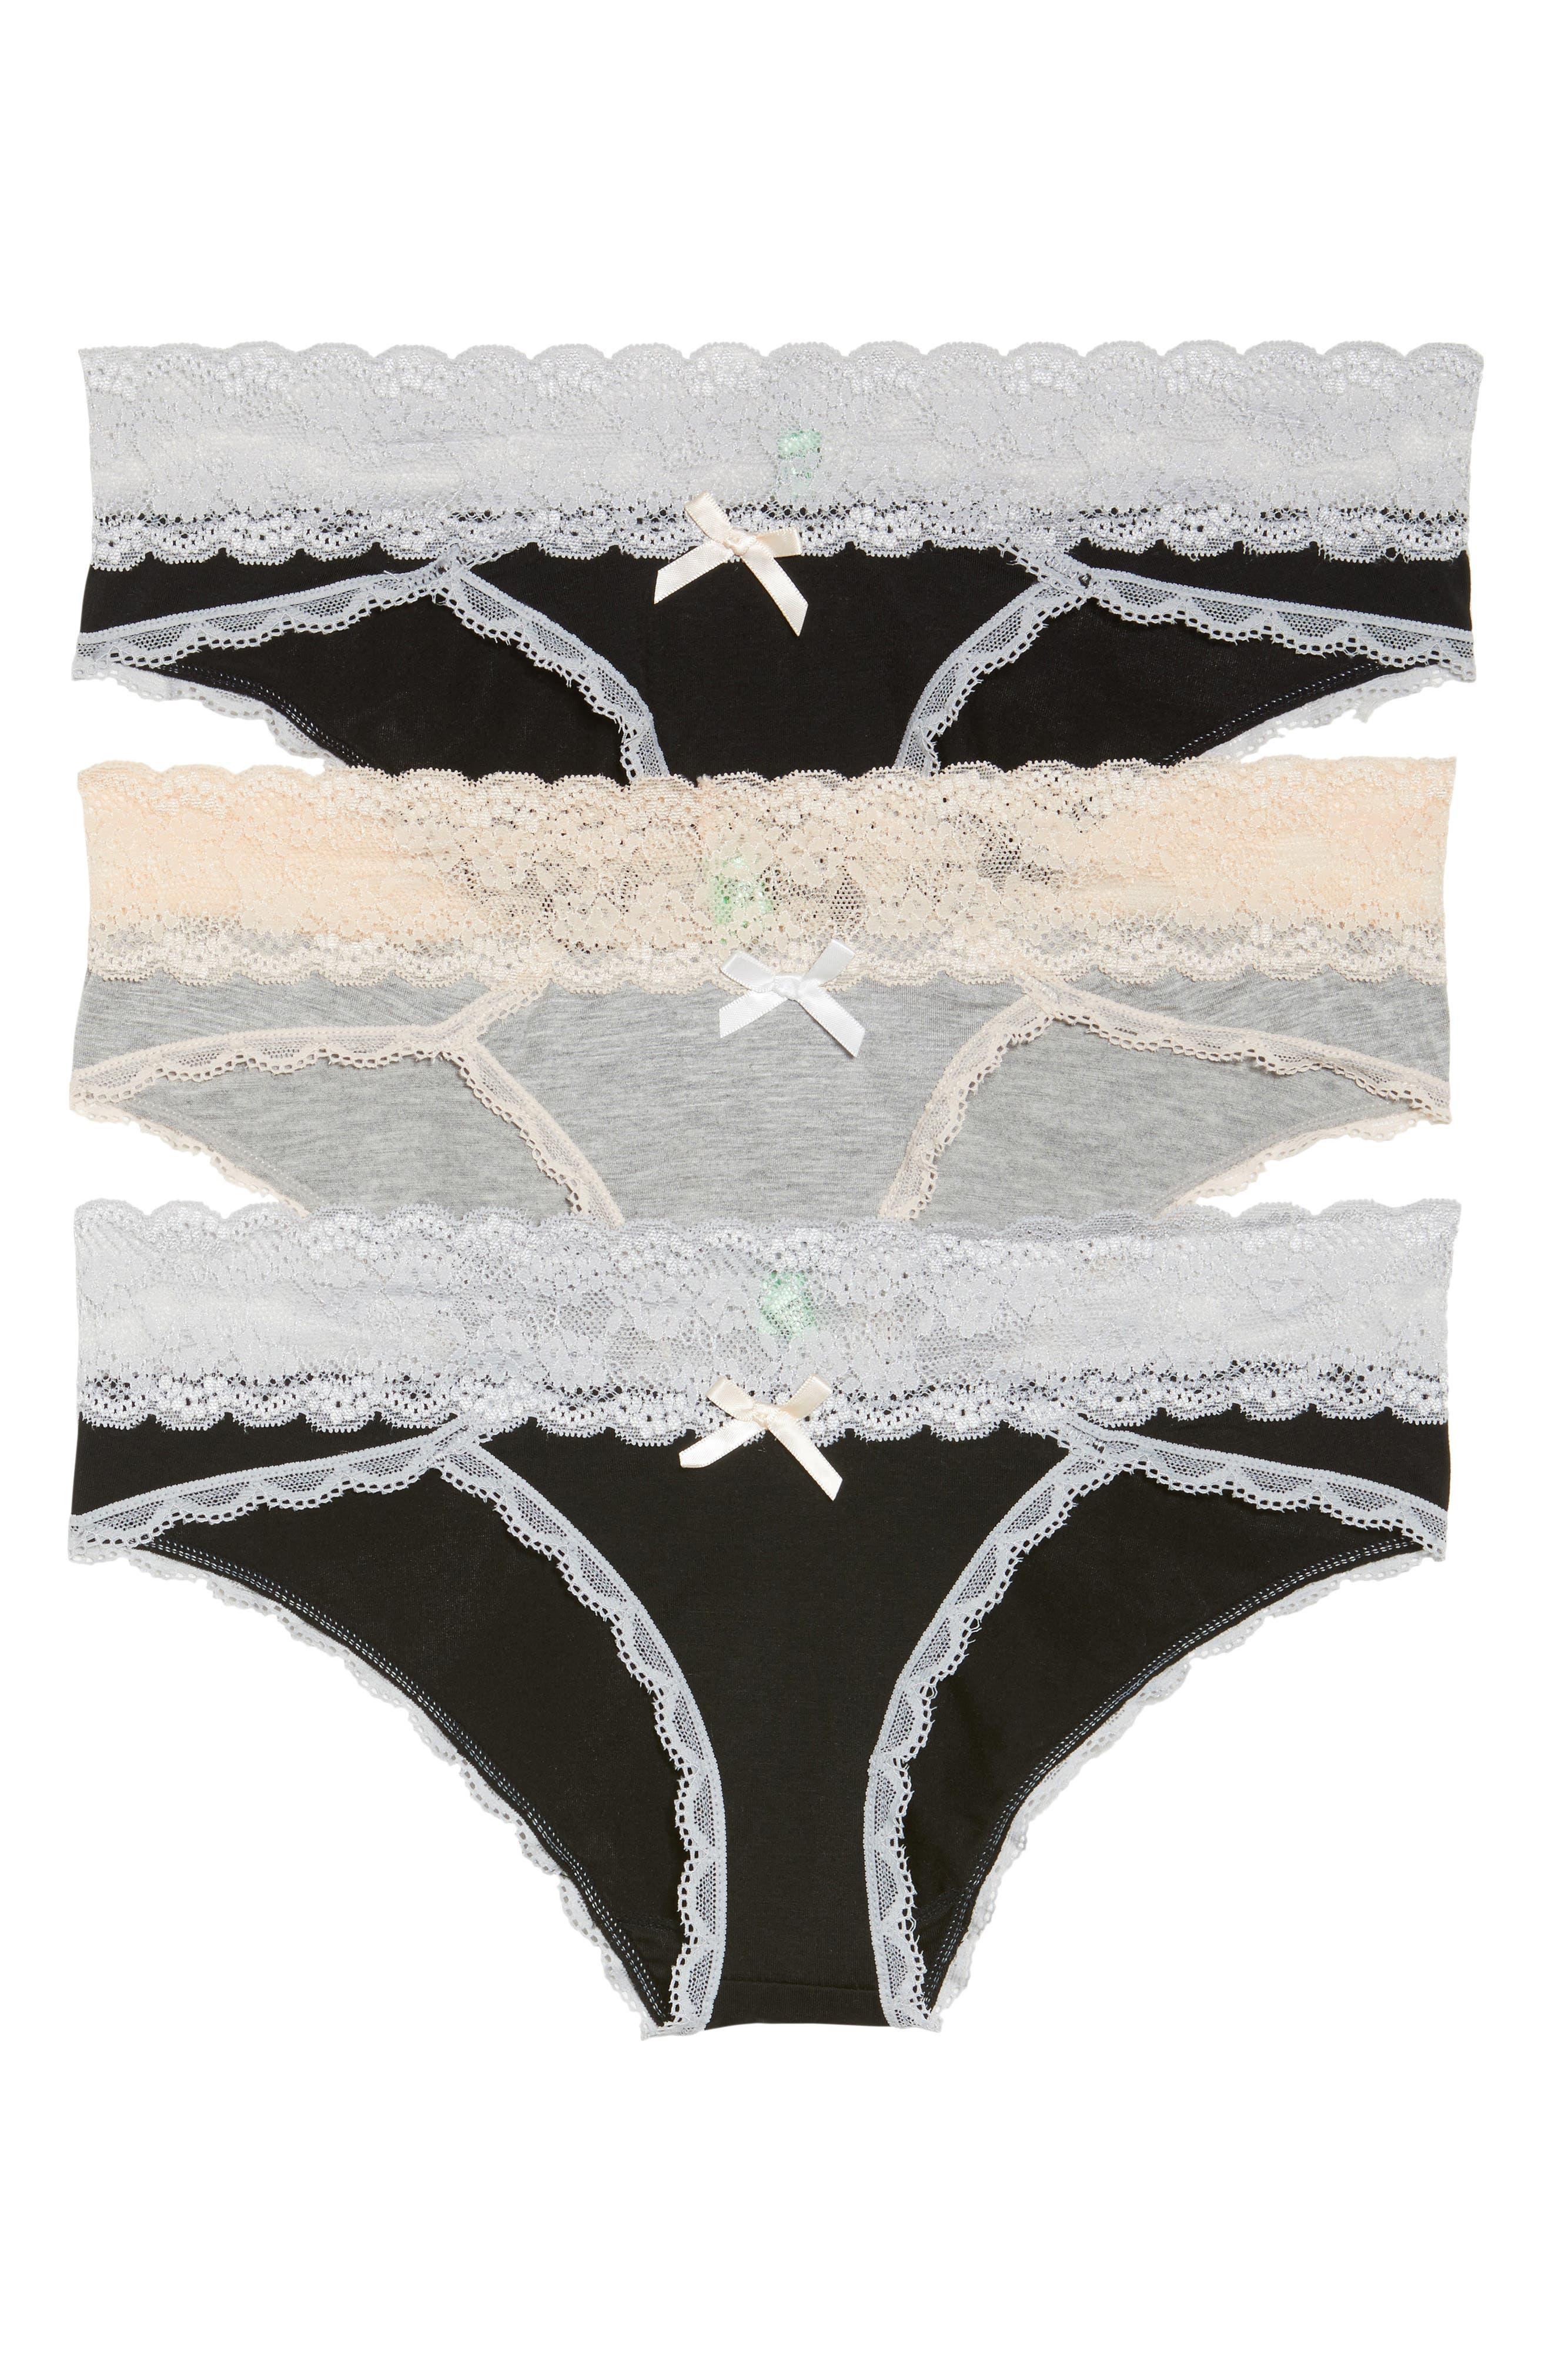 3-Pack Hipster Panties,                         Main,                         color, Black/ Heather Grey/ Black